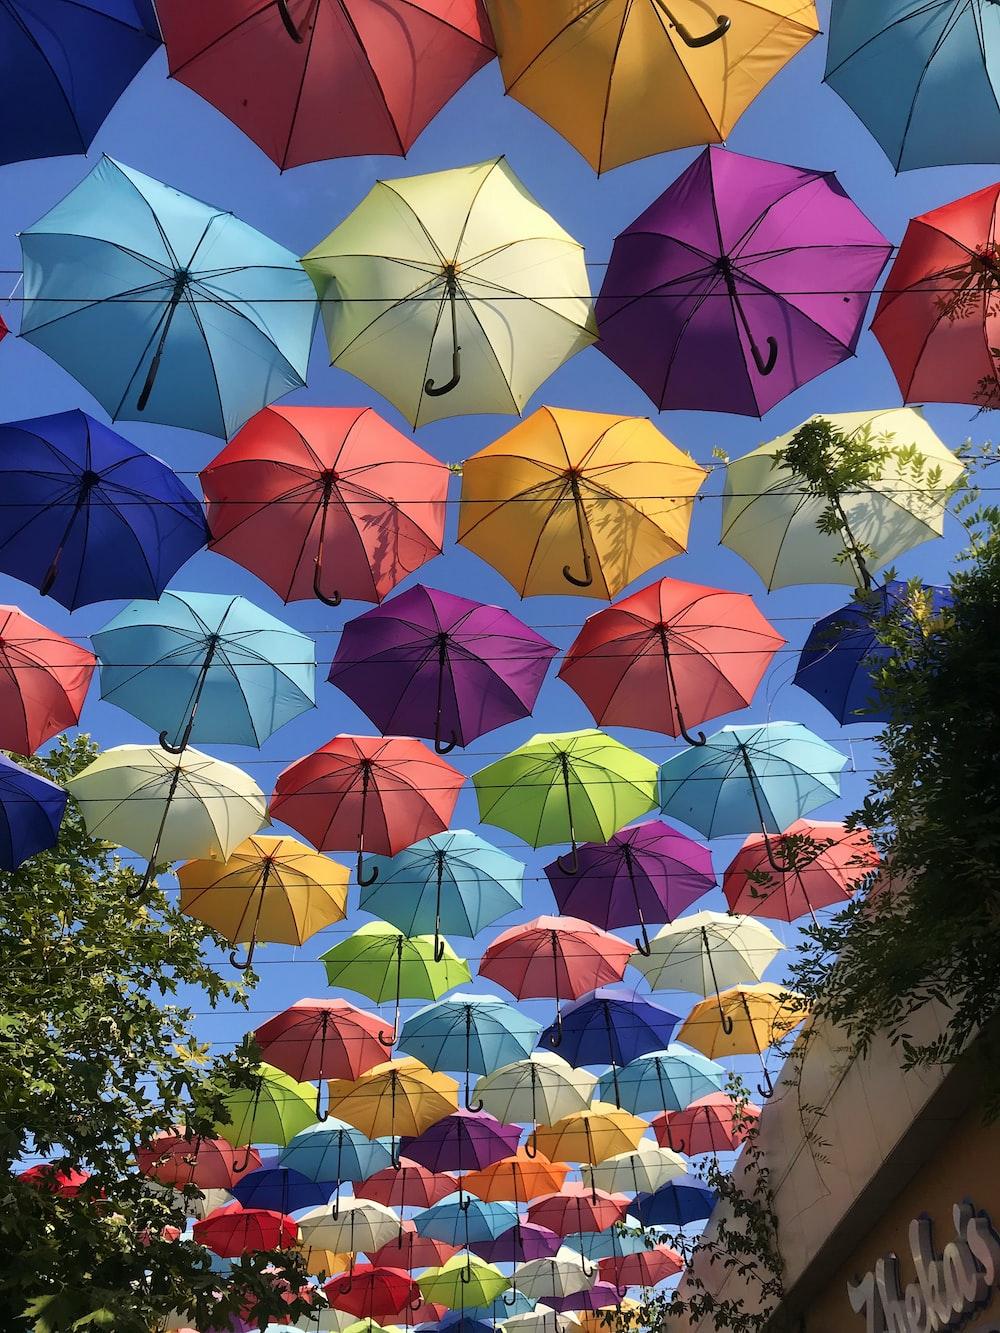 assorted-color umbrellas roof